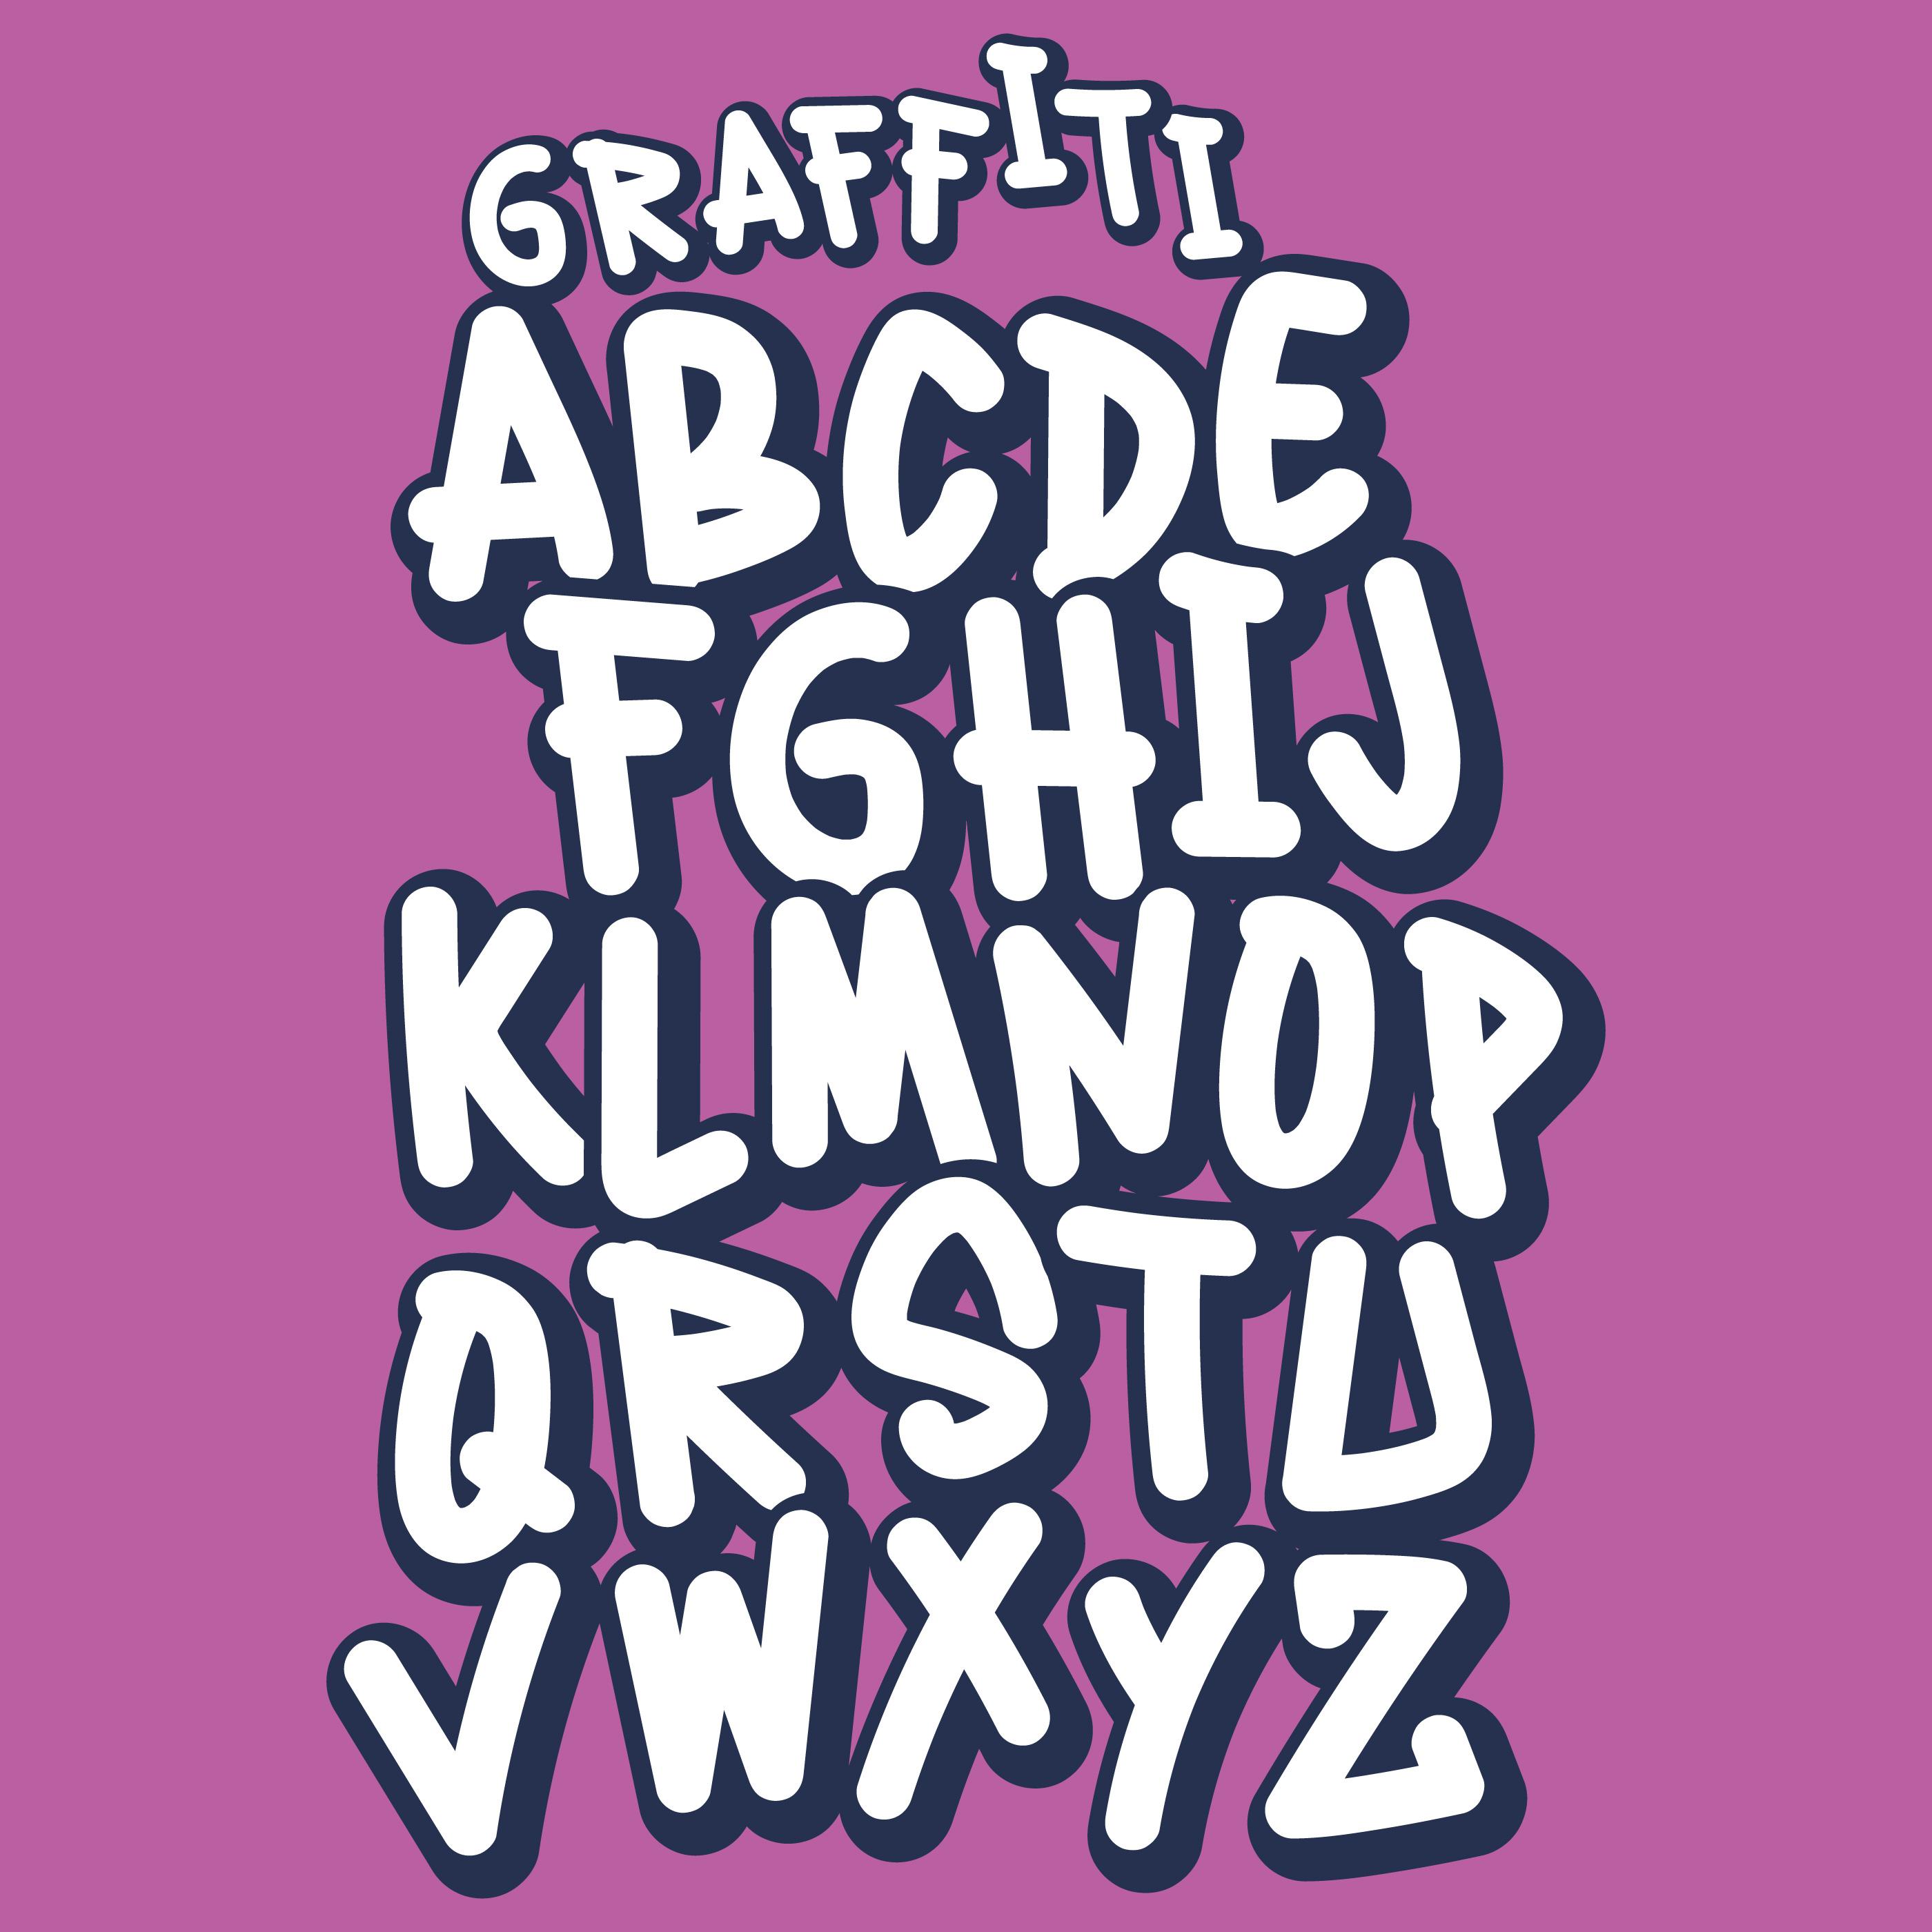 Handmade street style graffiti font download free vector art stock graphics images